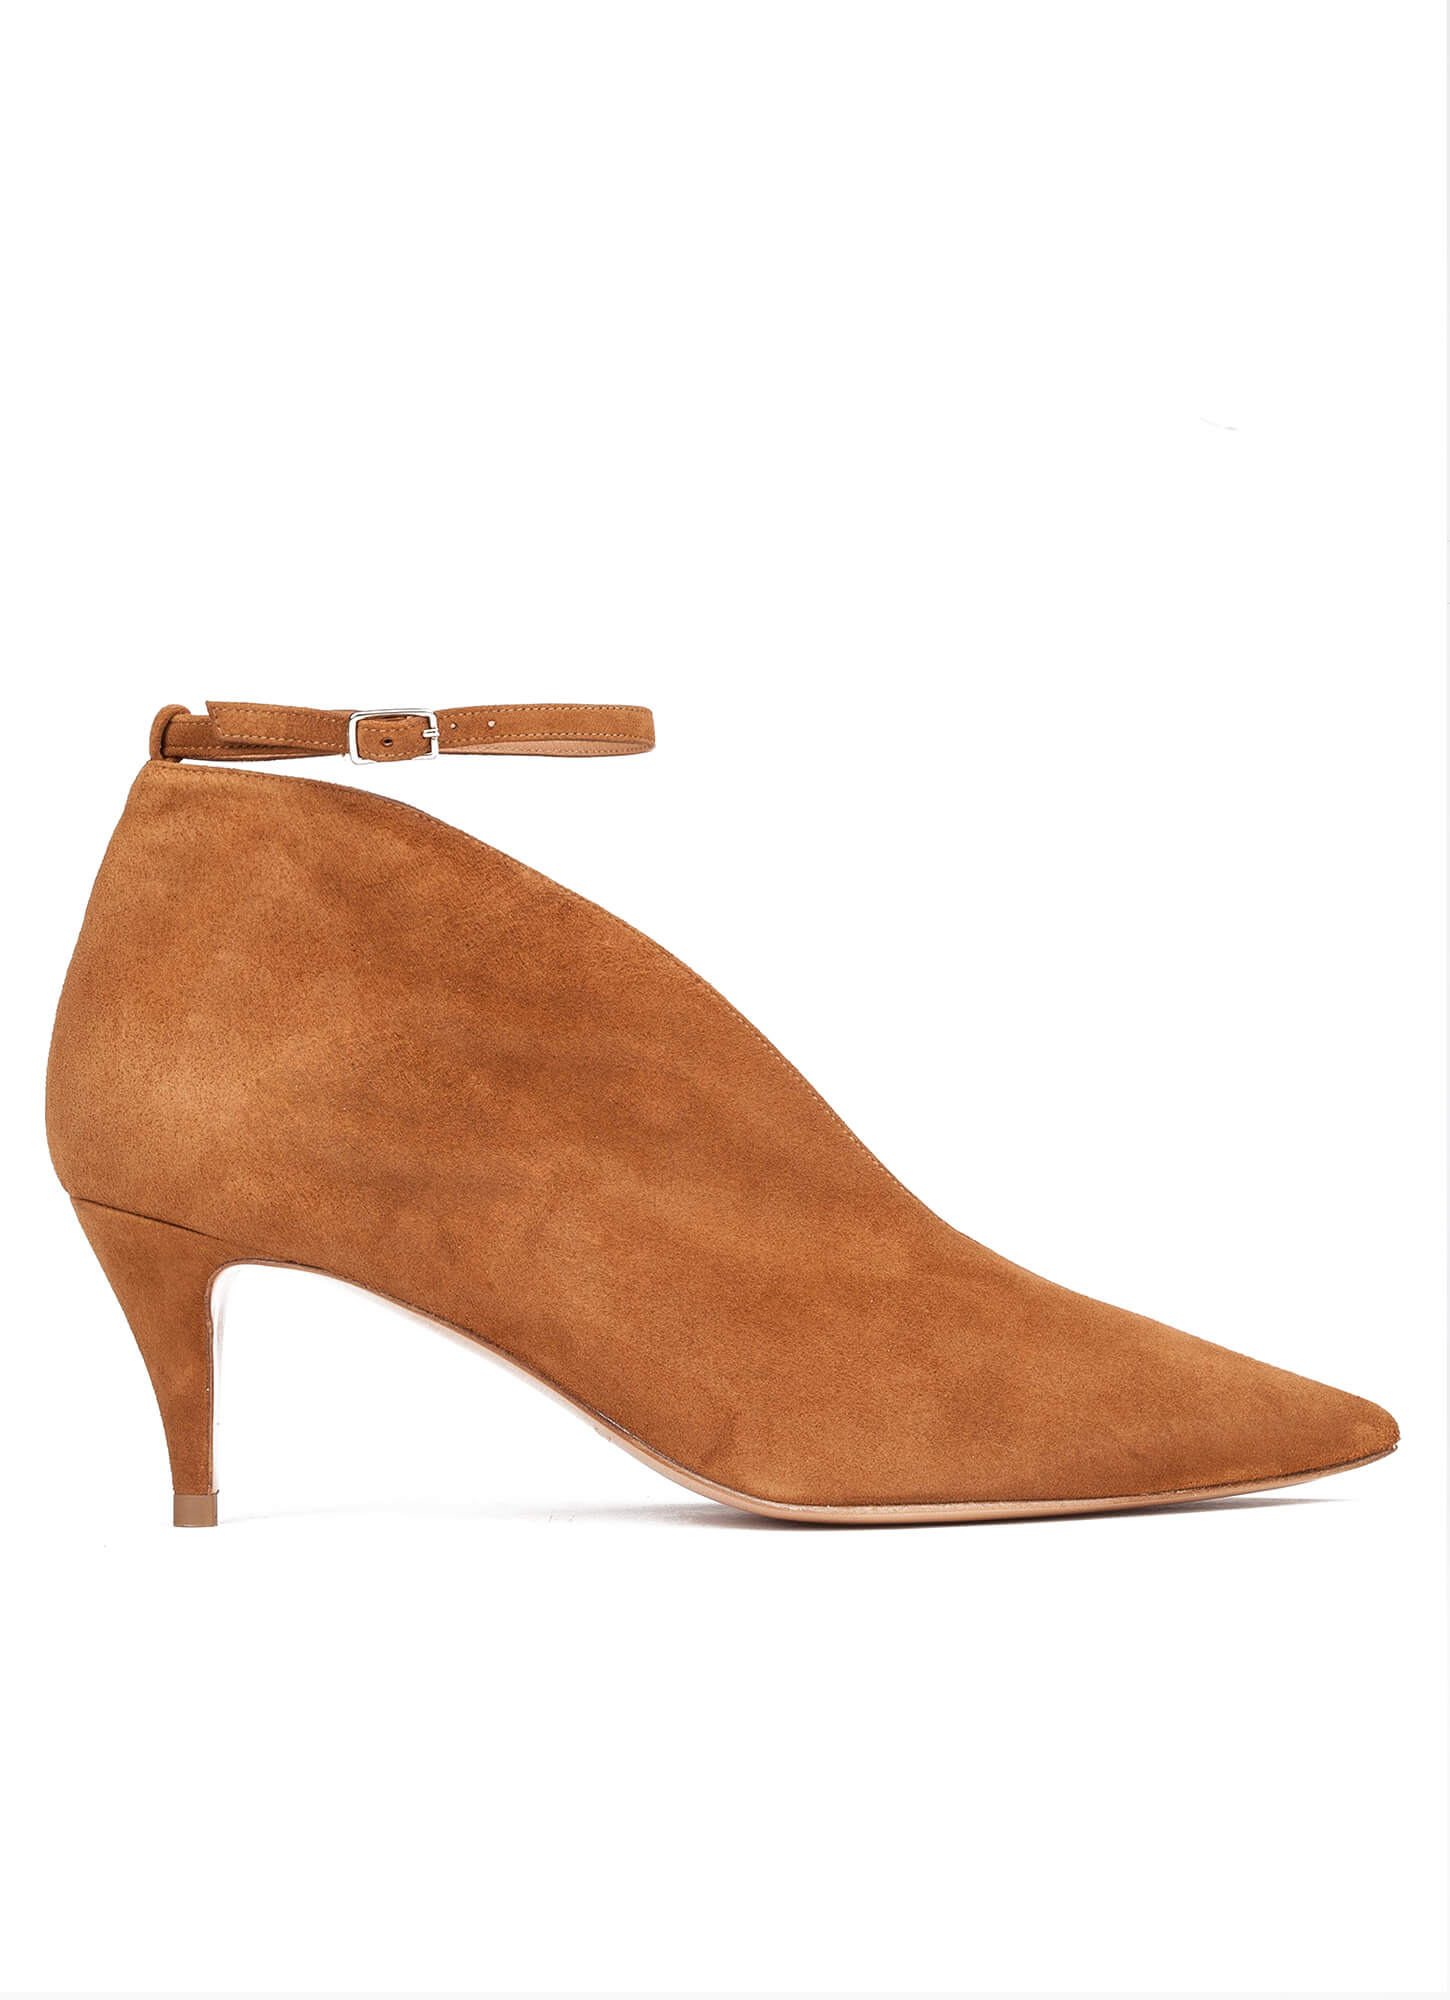 4cee0da6b9f5 Ankle strap mid heel shoes in chestnut suede Chestnut ankle strap mid heel  pumps - online shoe store Pura Lopez Latisha ...